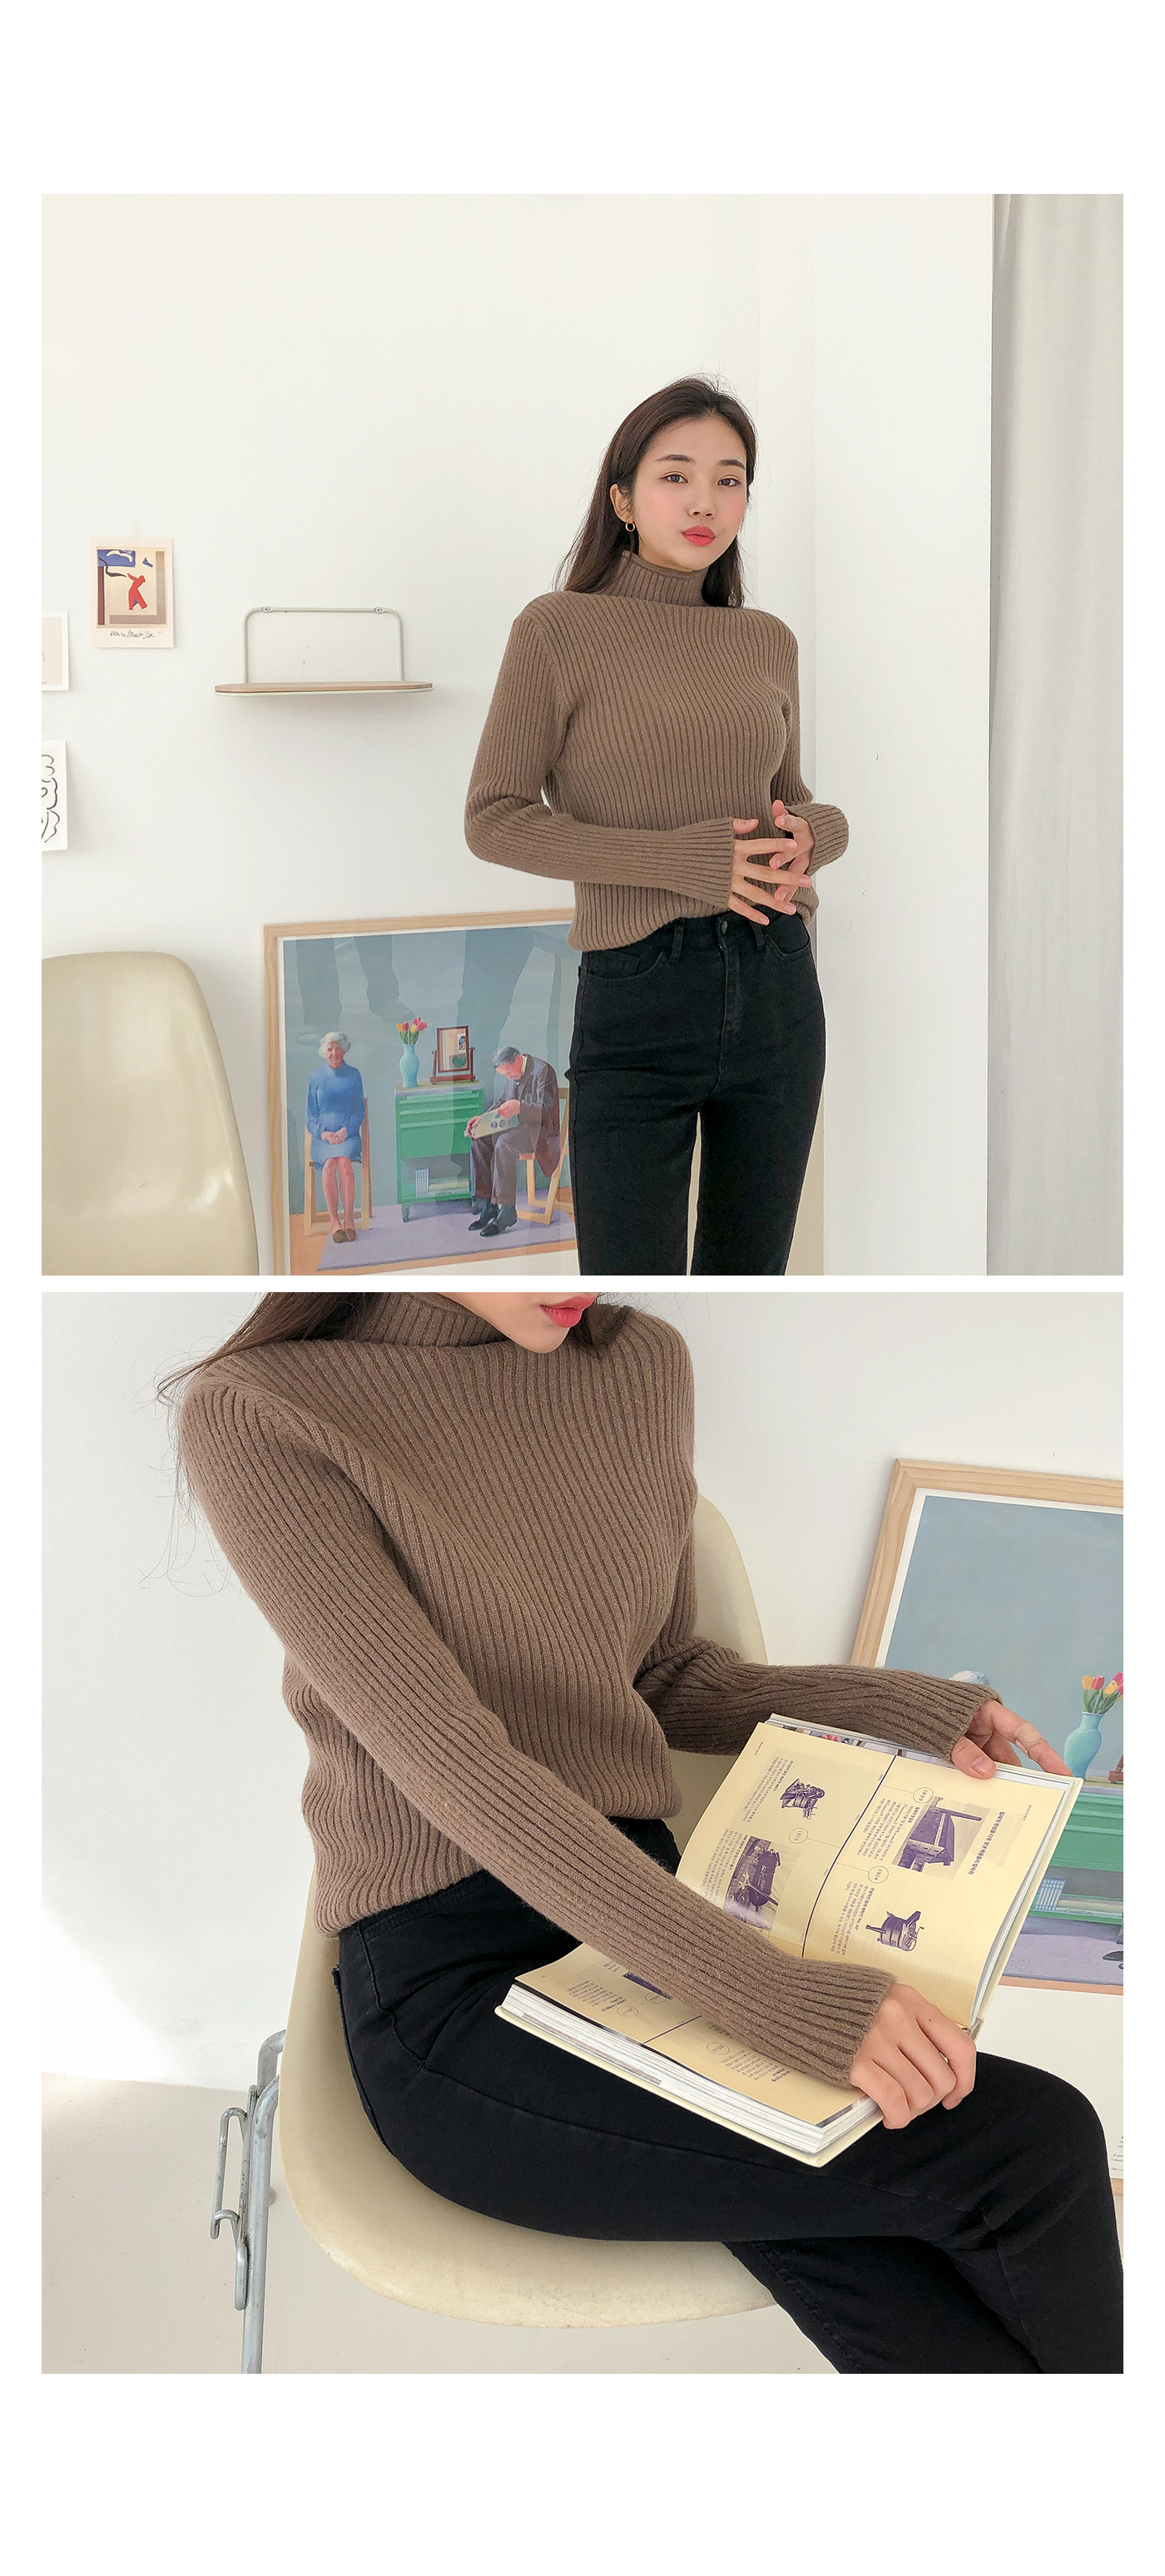 Pond ribbed knit